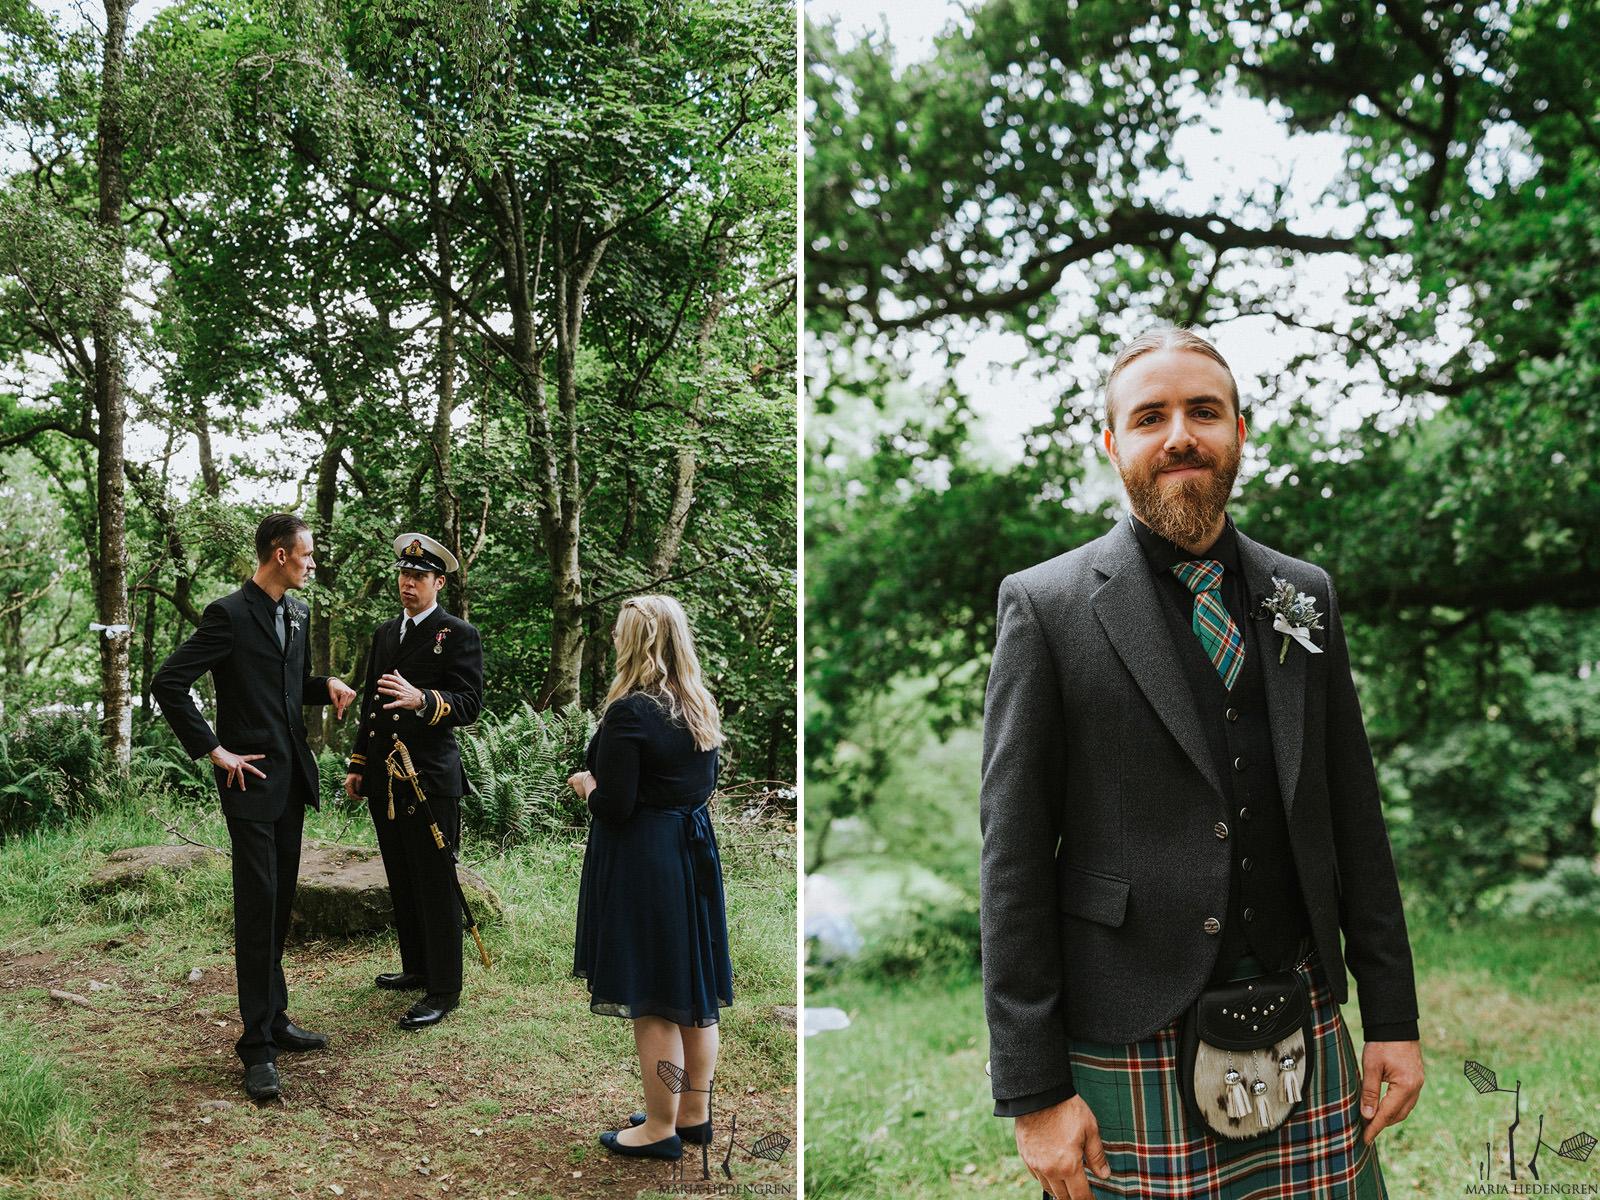 scottish groom attire